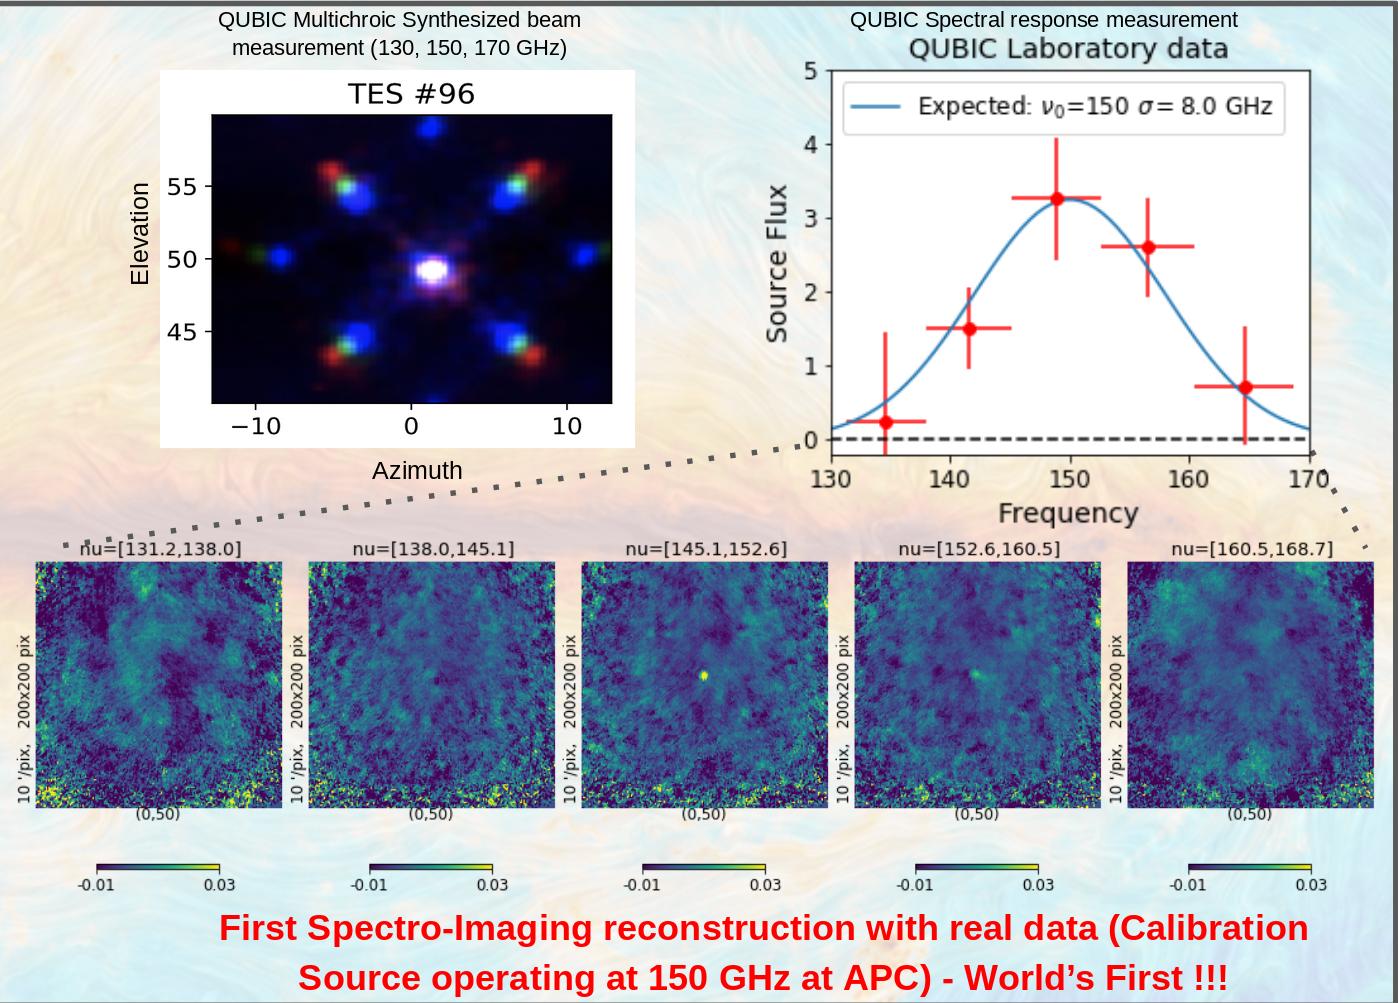 QUBIC spectral imaging